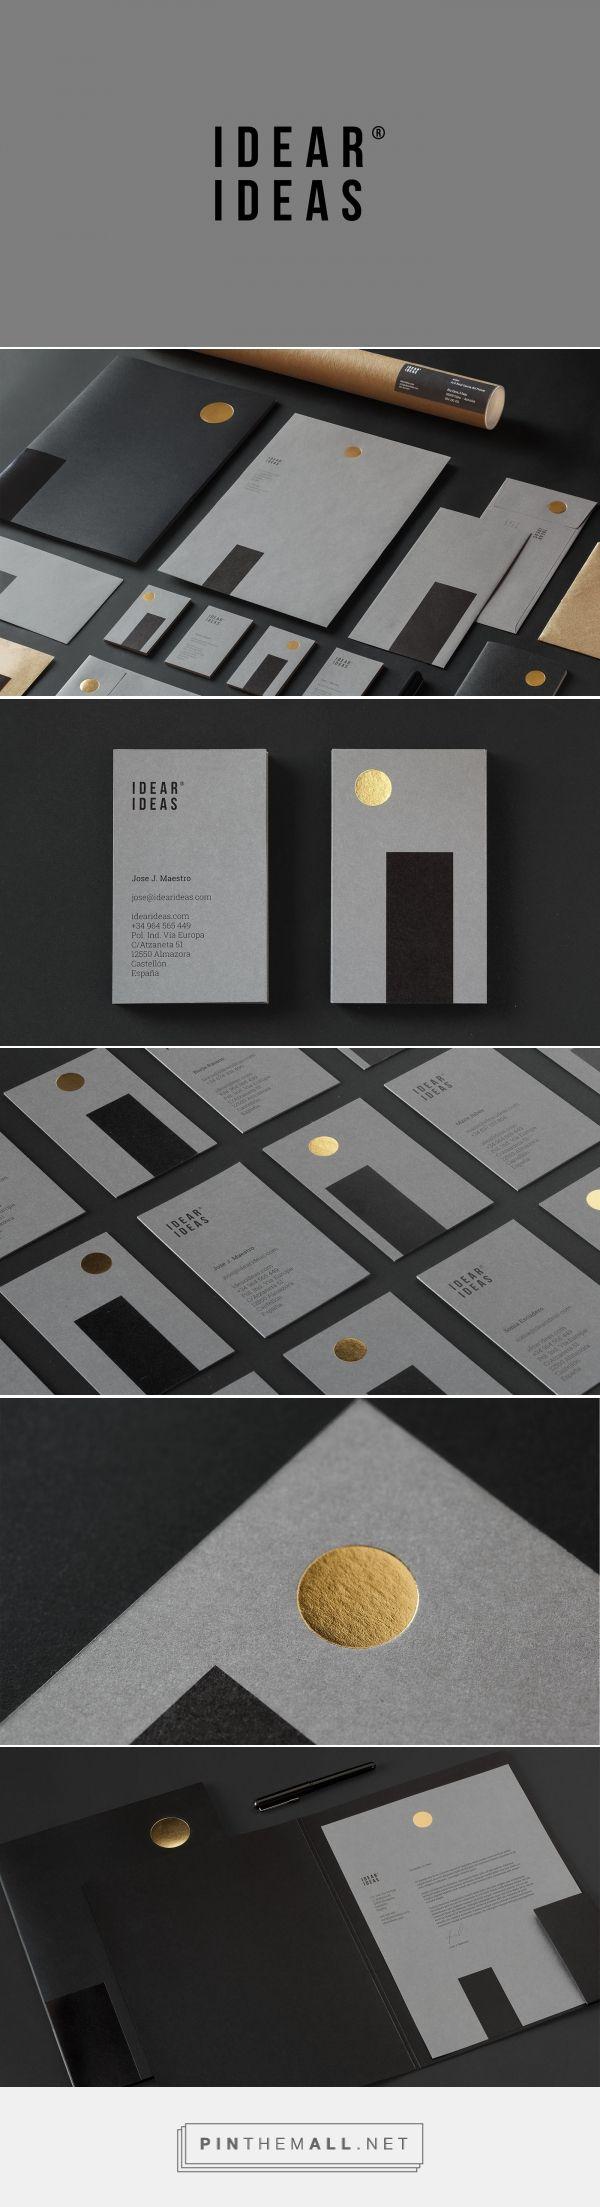 idear ideas branding on behance fivestar branding design and branding agency inspiration. Black Bedroom Furniture Sets. Home Design Ideas